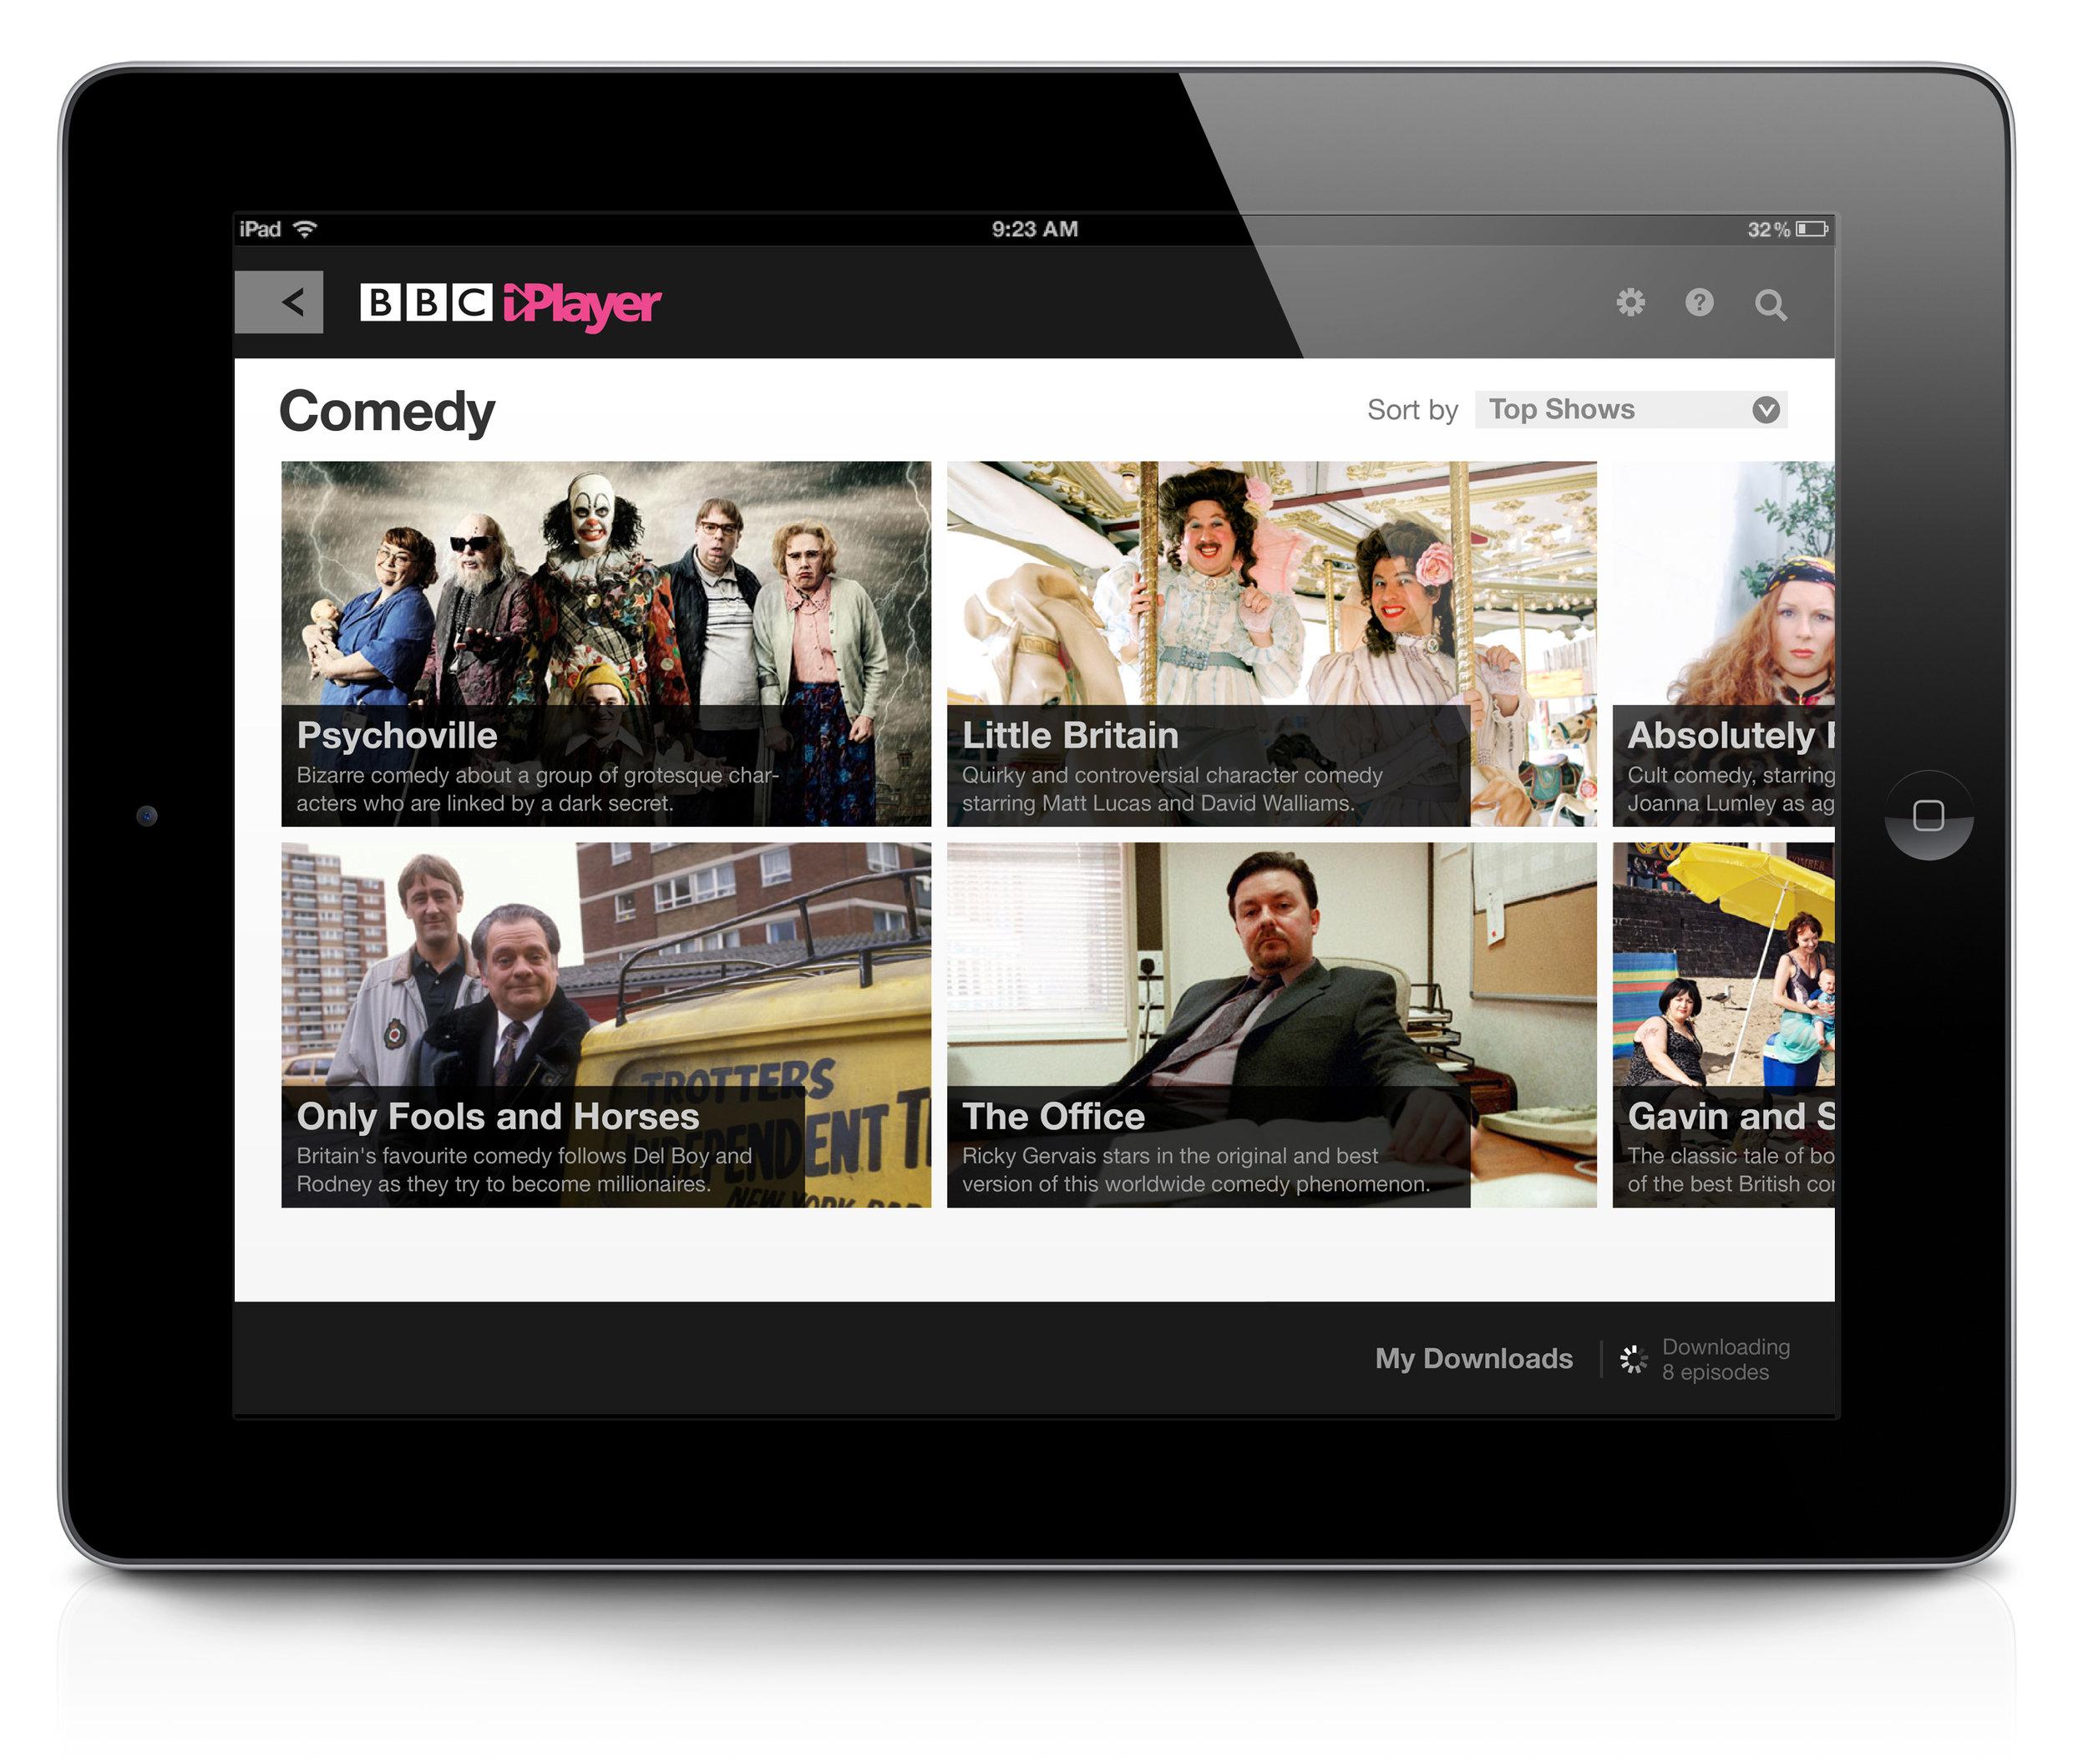 iPlayer_iPad2_Showbrowser.jpg